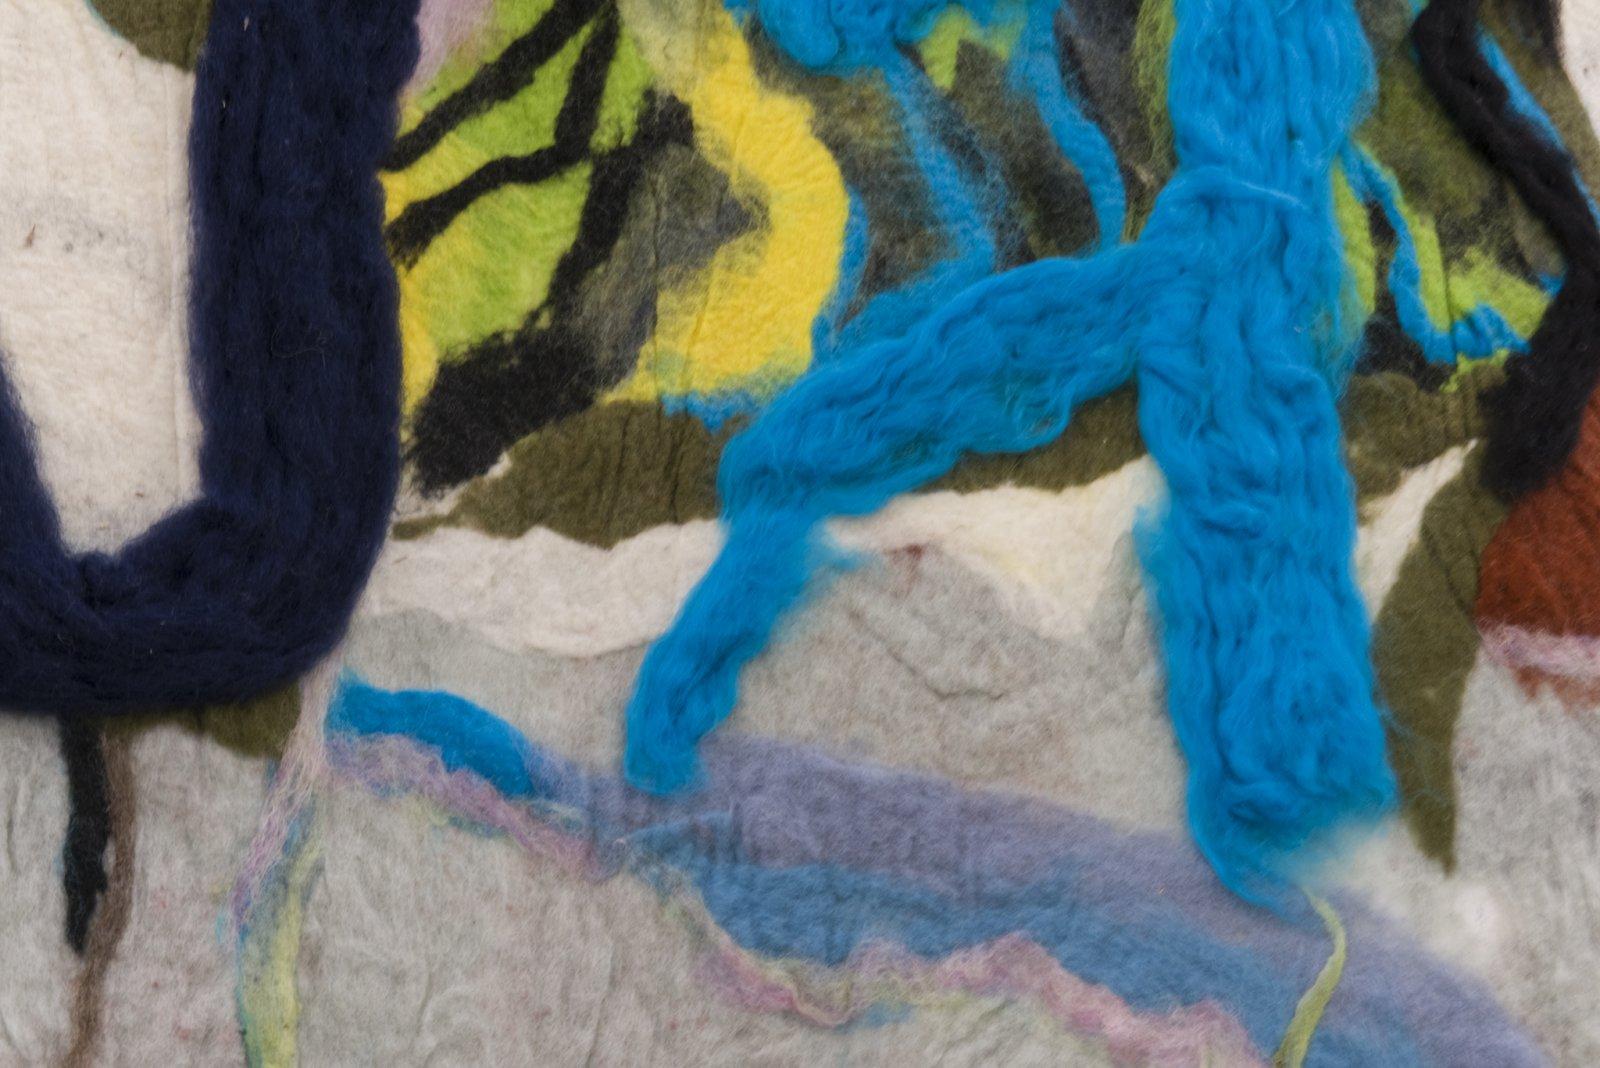 Rebecca Brewer, Bilitis (detail), 2016, wool felt, painted aluminum, 132 x 63 in. (335 x 160 cm) by Rebecca Brewer